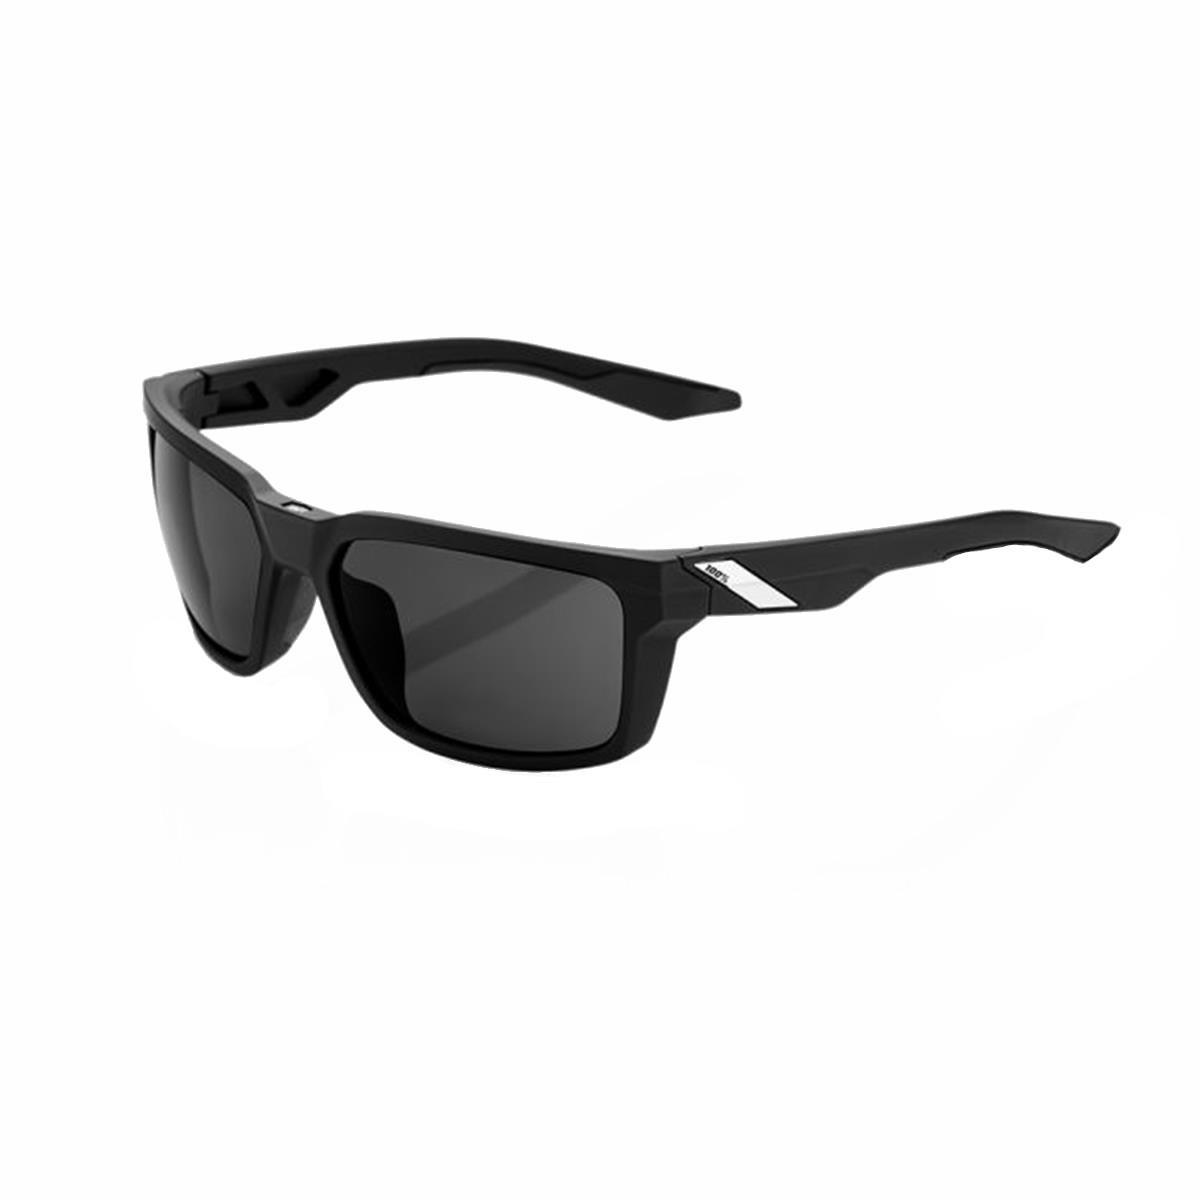 100% Sportbrille Daze Soft Tact Black - Smoke Lens